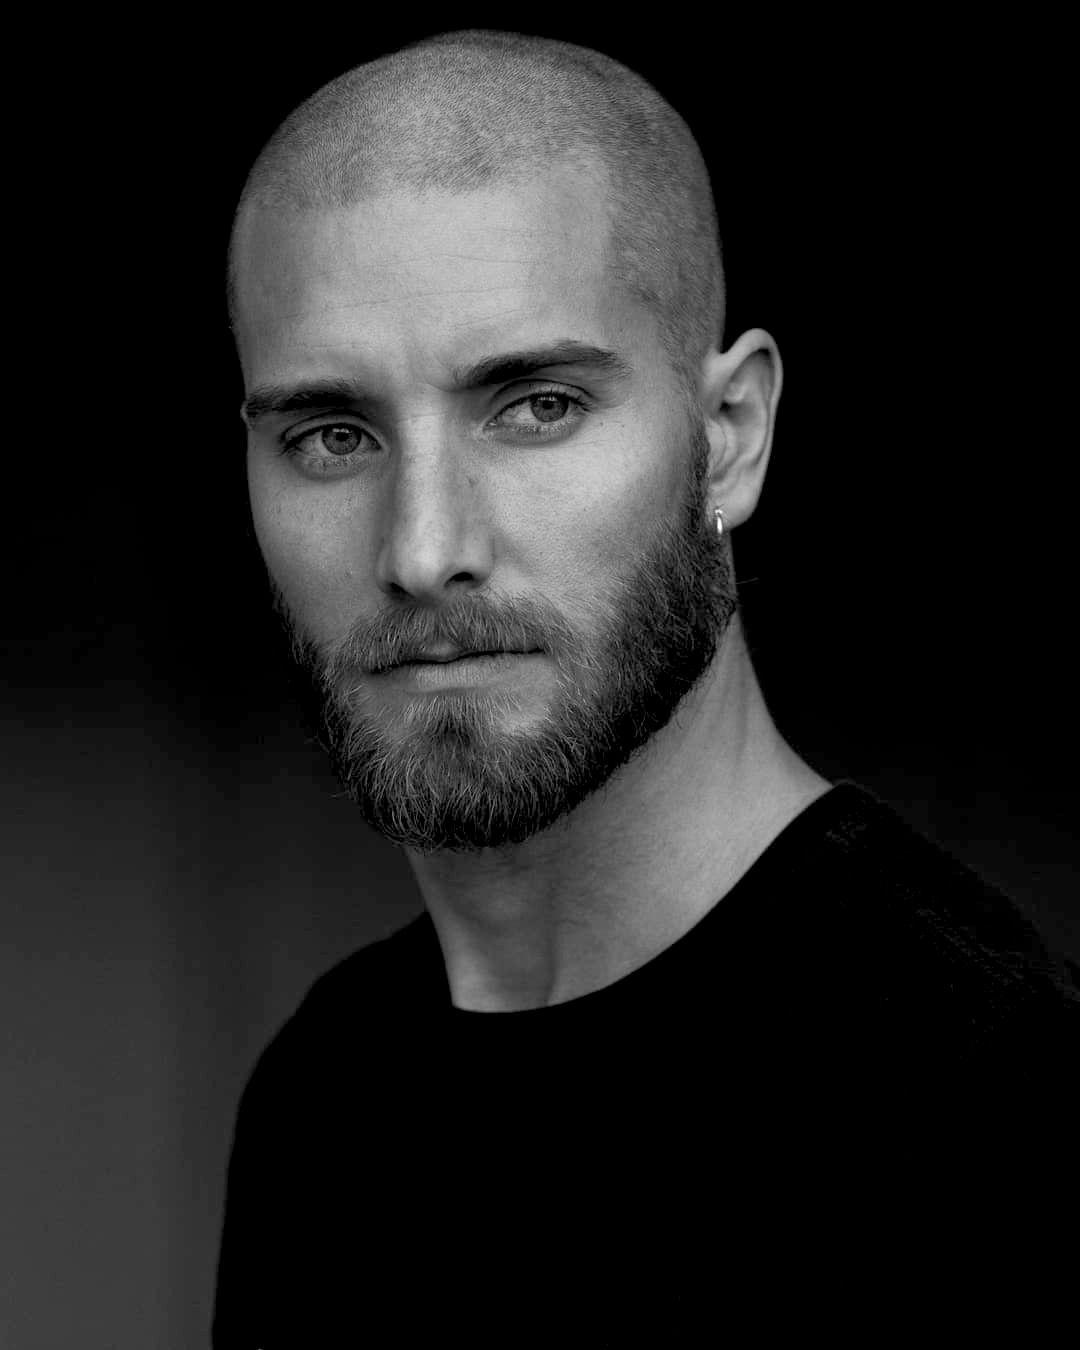 Sweet Lord Long Hair Styles Men Bald With Beard Beard Styles Short